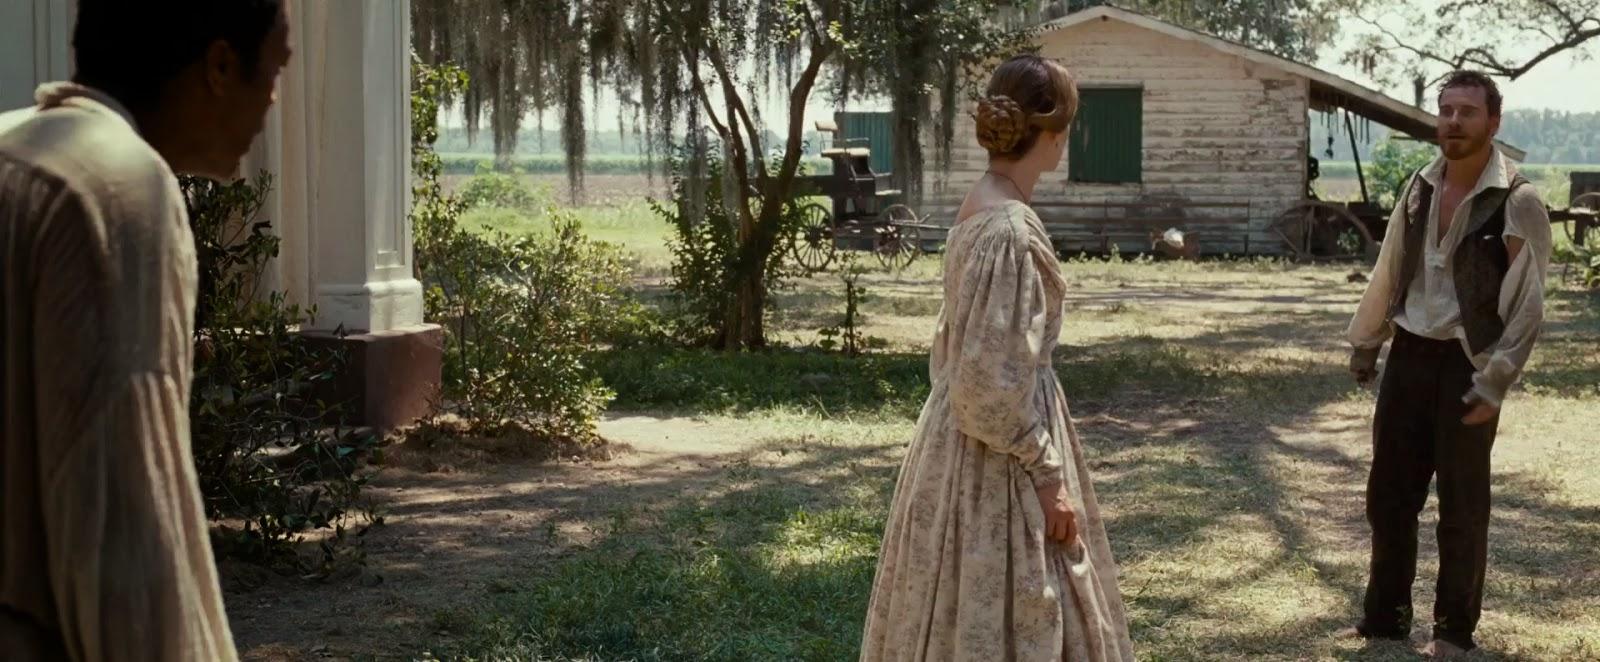 Slave 2013 Trailer Jfk Trailer German -> Pelismegahd